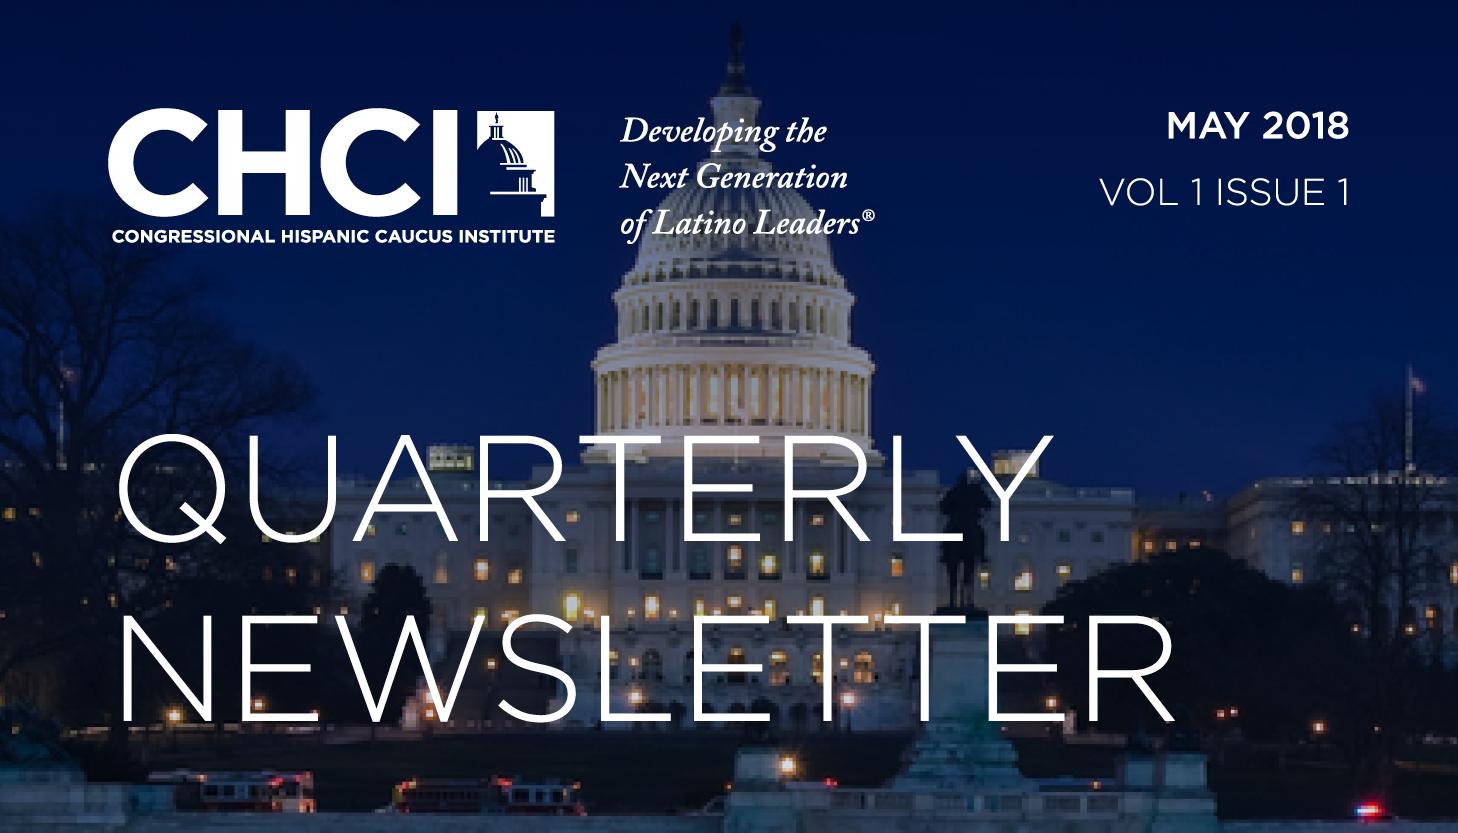 ICYMI: CHCI's 2018 Spring Quarterly Newsletter